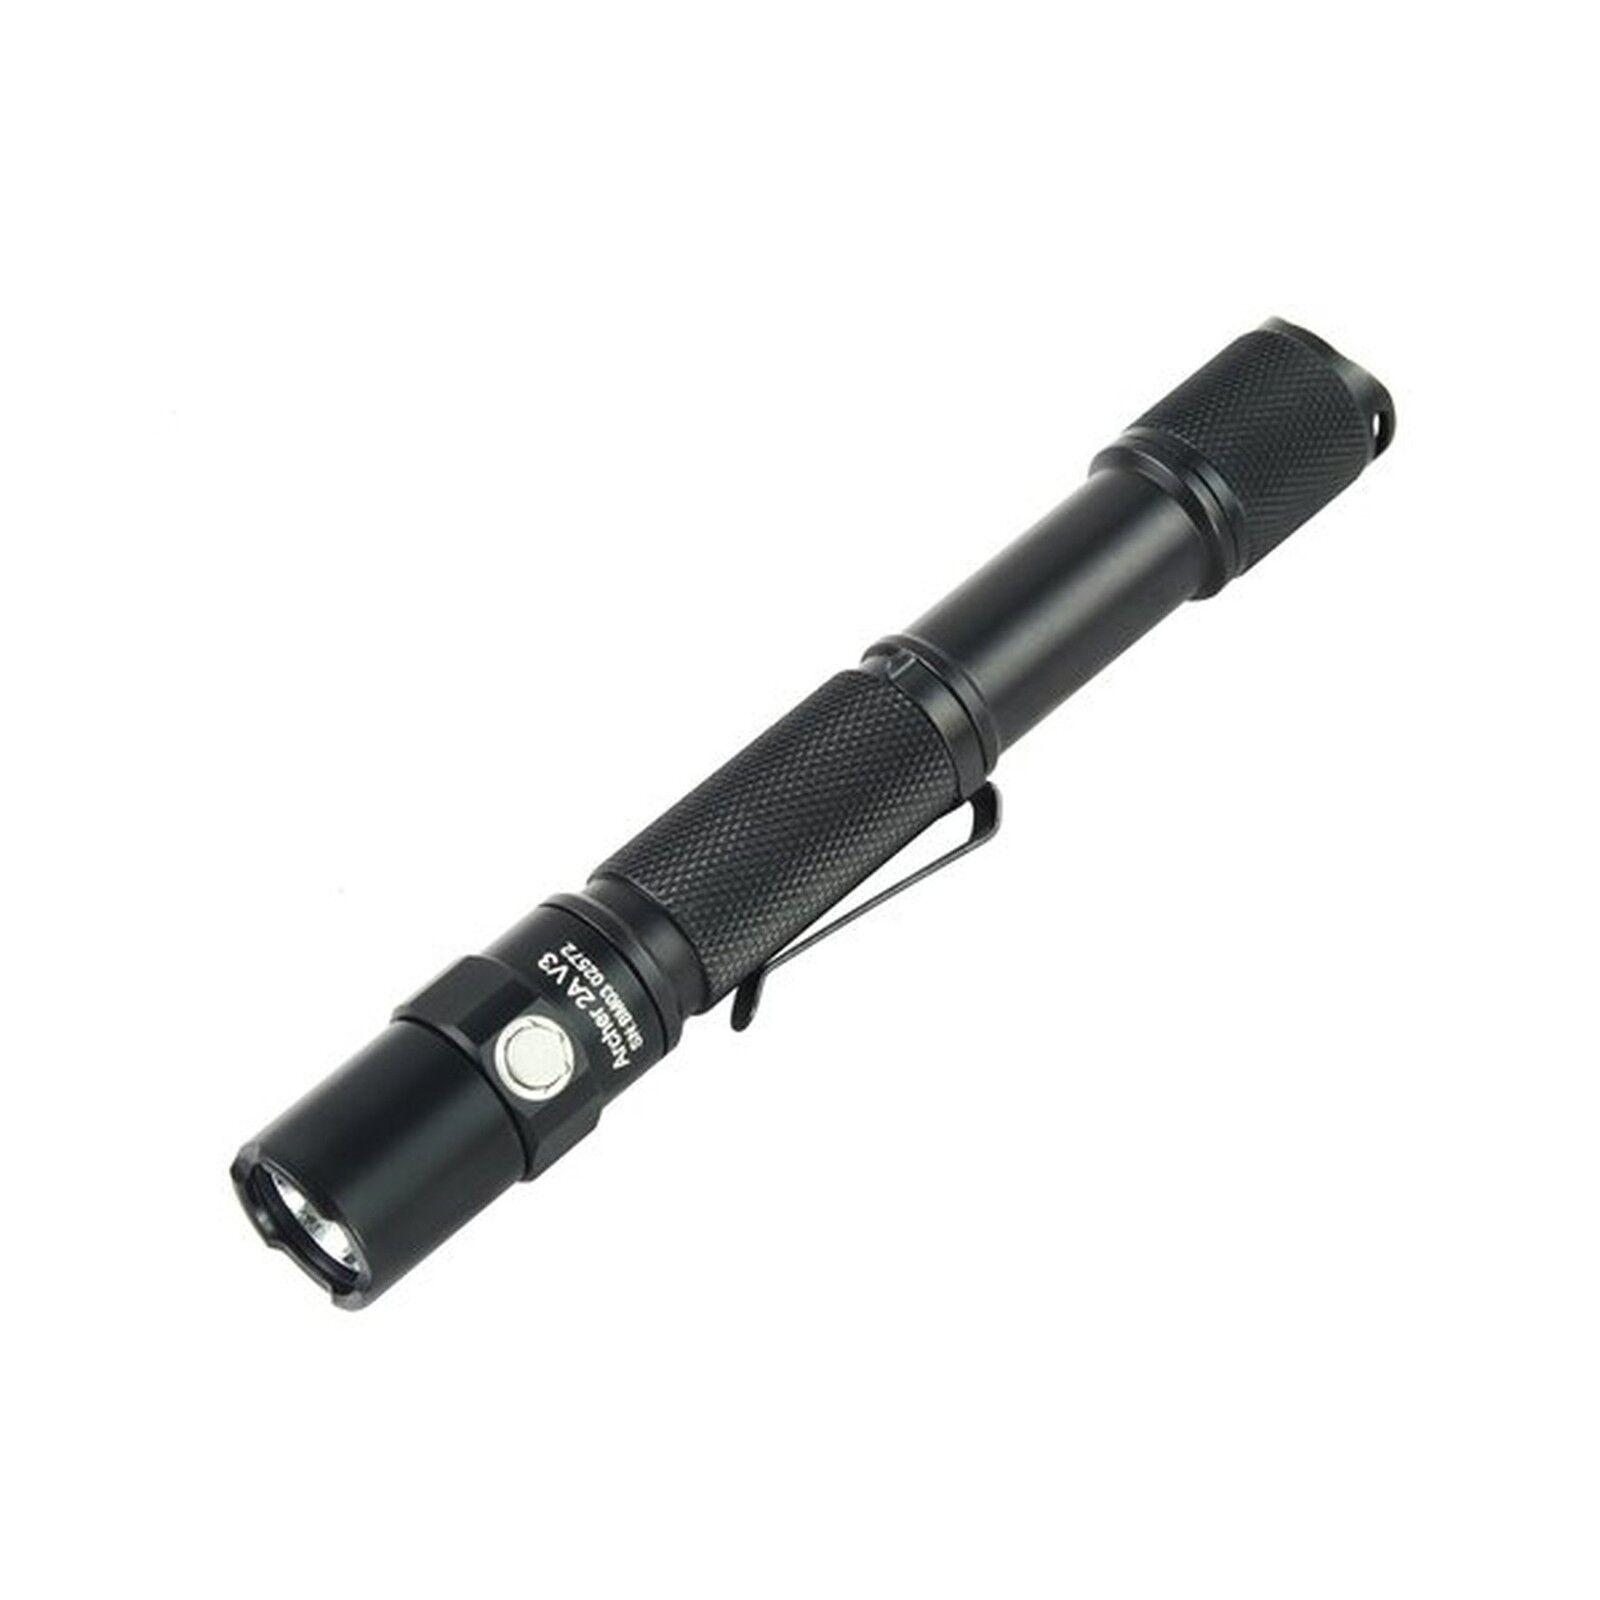 ThruNite Archer 2A V3 Neutral White 500 Lumens AA LED Flashlight Free Shipping